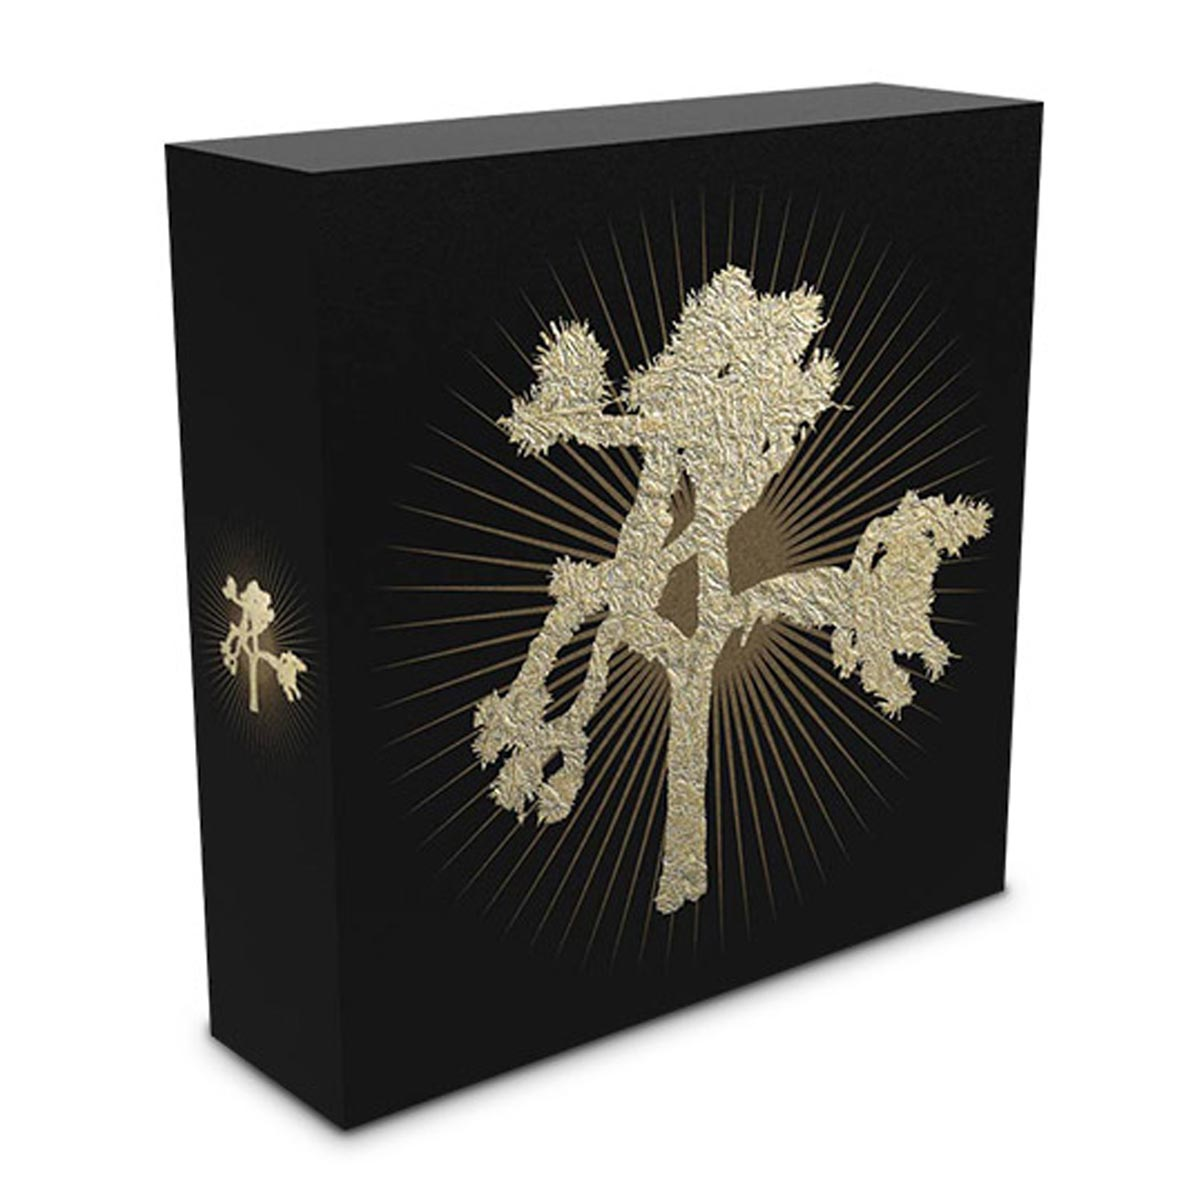 U2 The Joshua Tree - 30th Anniversary bos special edition